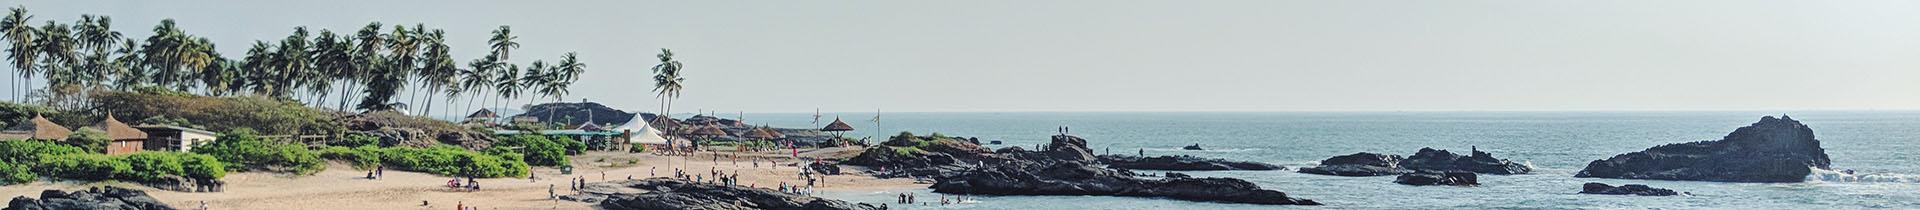 India Beach